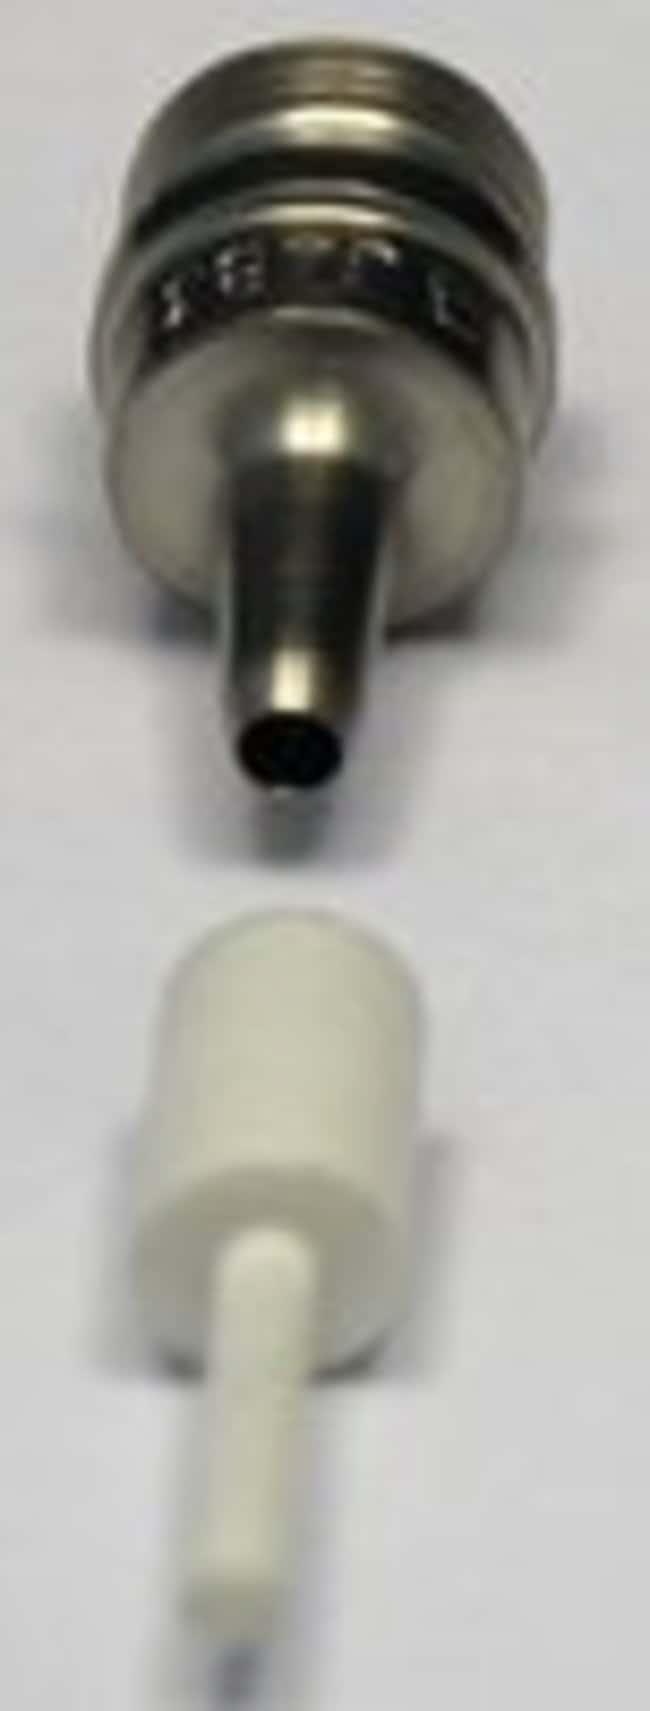 MilliporeSigma SupelcoSelectophore Punch-Module